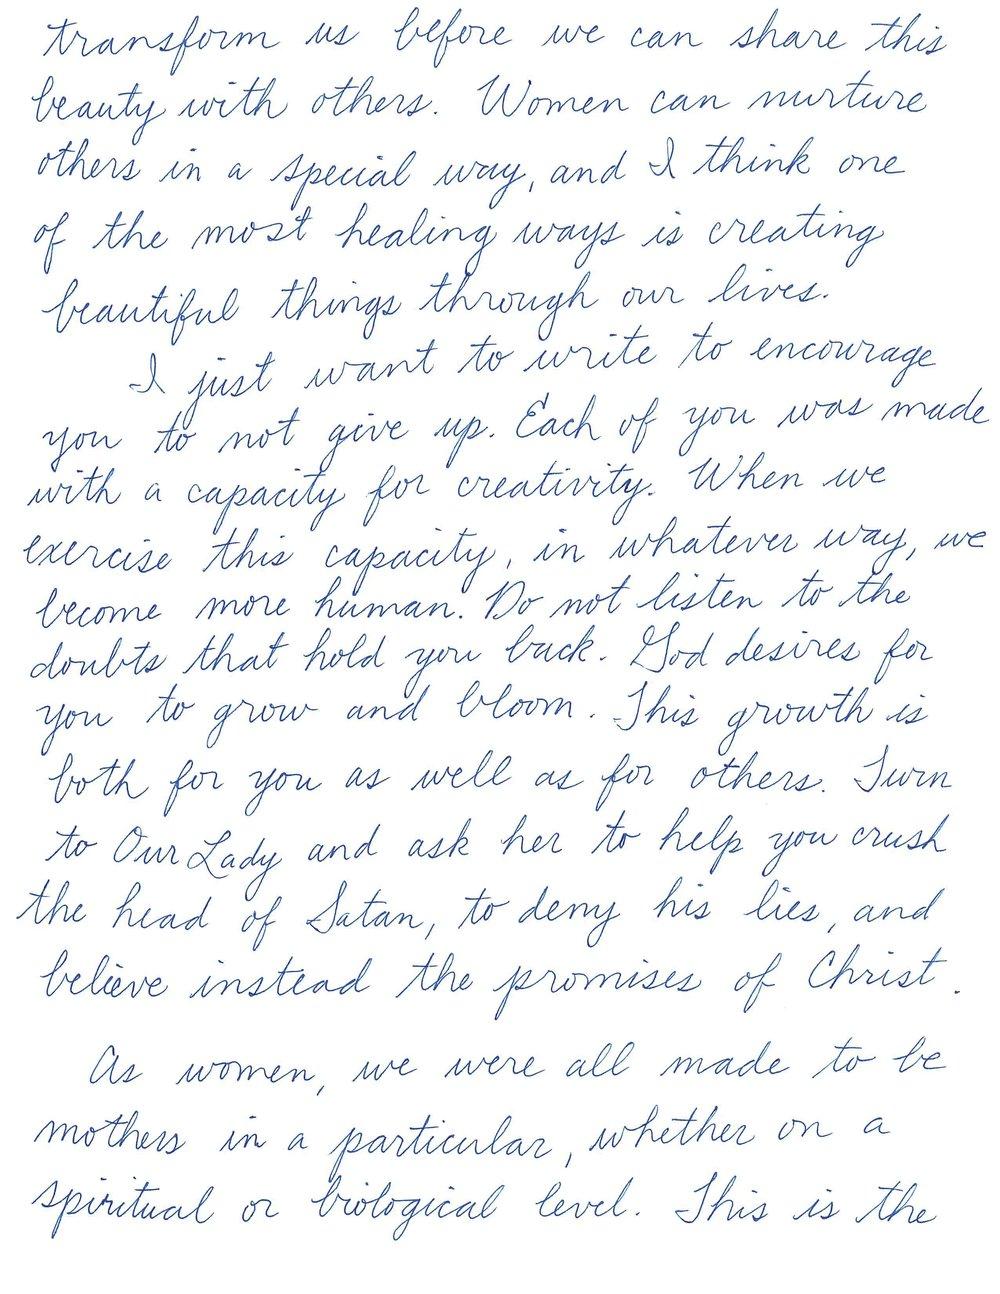 Handwritten Letter to Women final76.jpg